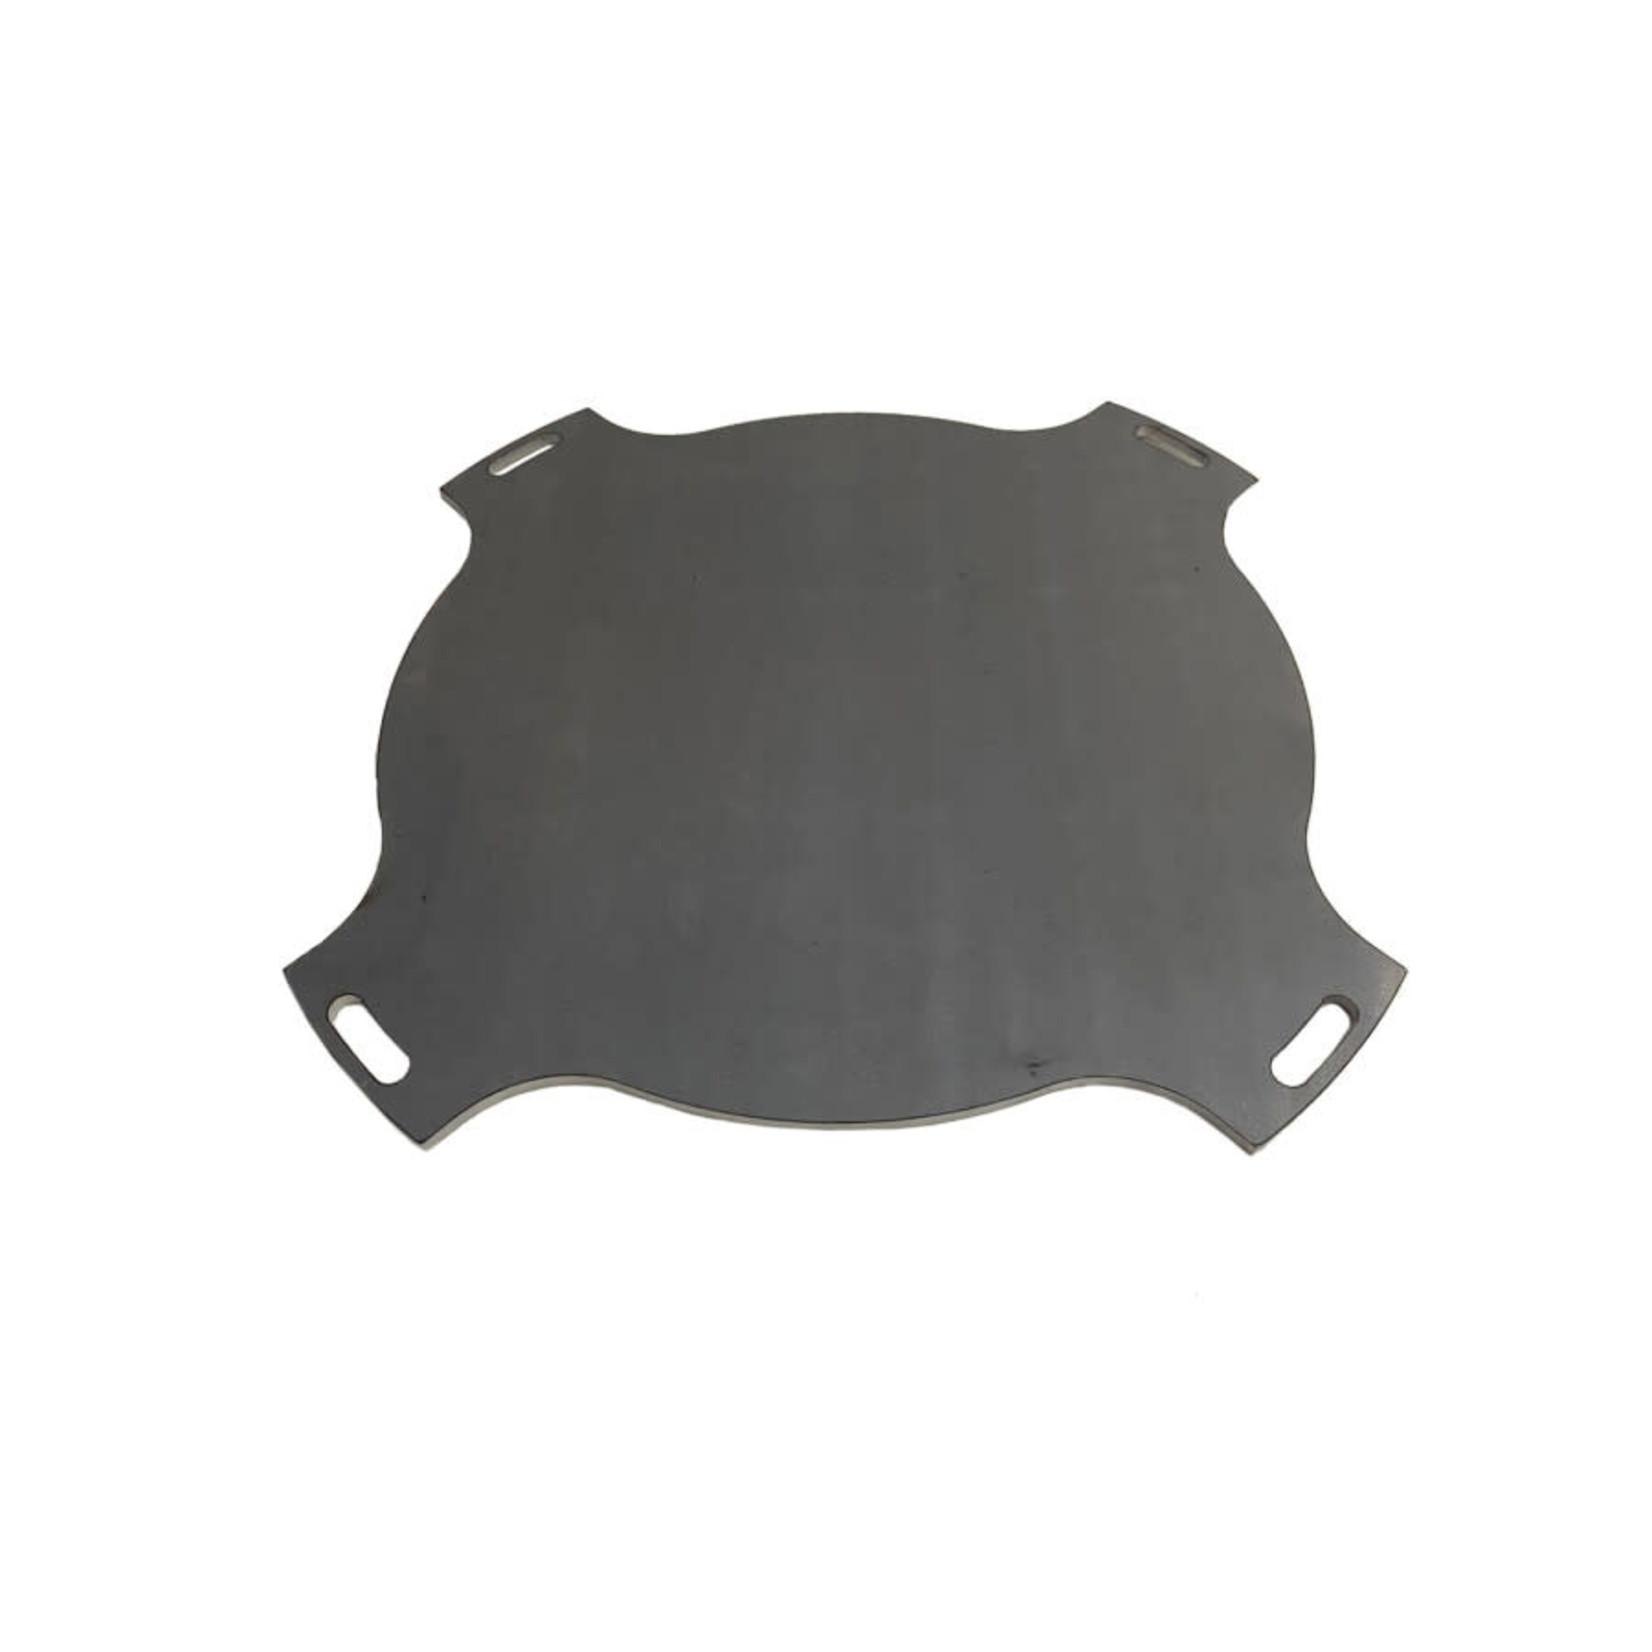 Yakinku Compact Teppanyaki plaat